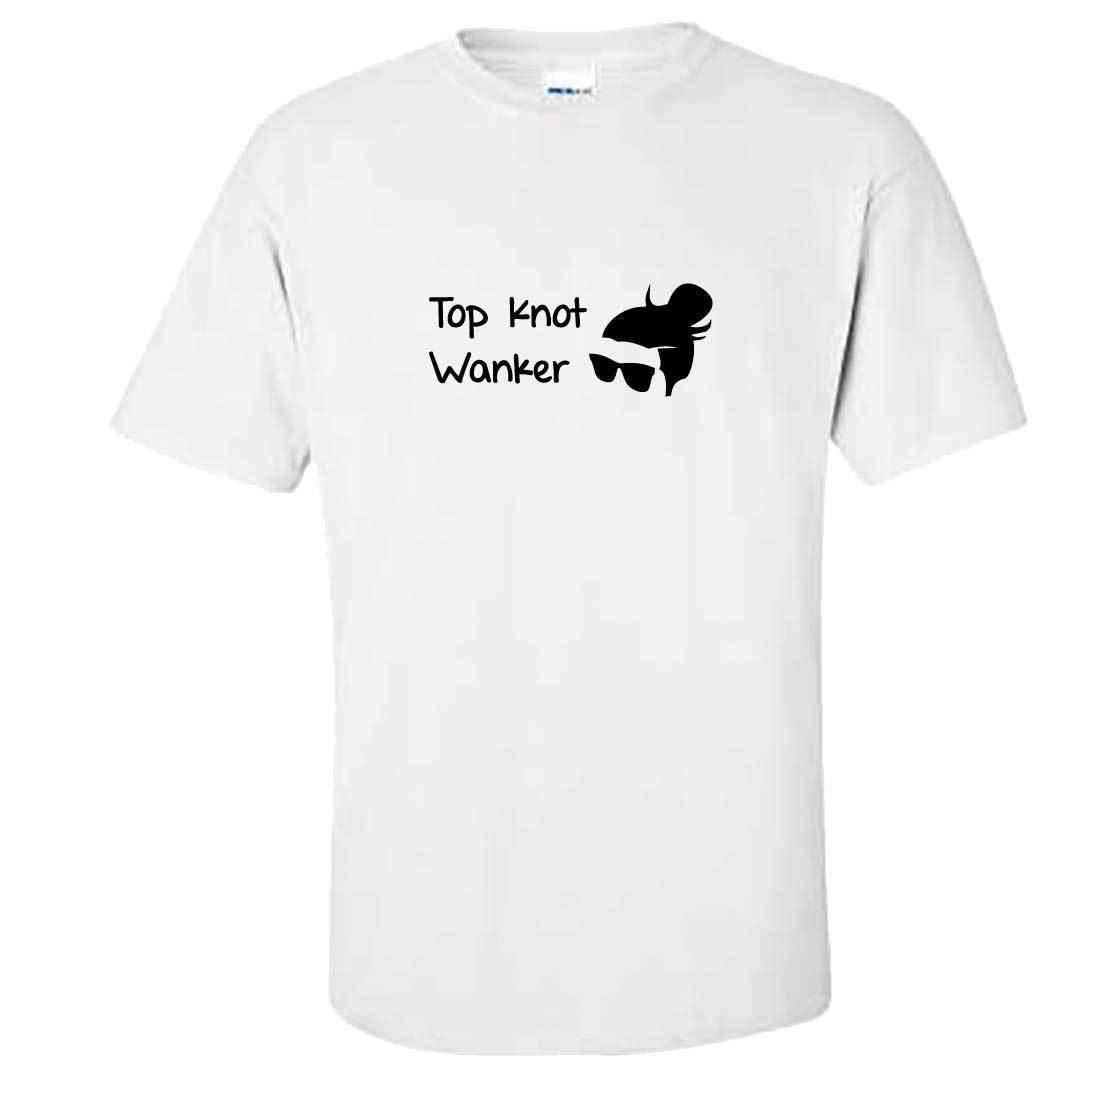 23d0a8c512 Mens Top Knot T Shirt Man Bun Long Hair Funny Rude Joke Tshirt Gift Mens T  Shirt Summer O Neck 100% Cotton Men Short Sleeve Tee Shirts With Design  Unique T ...